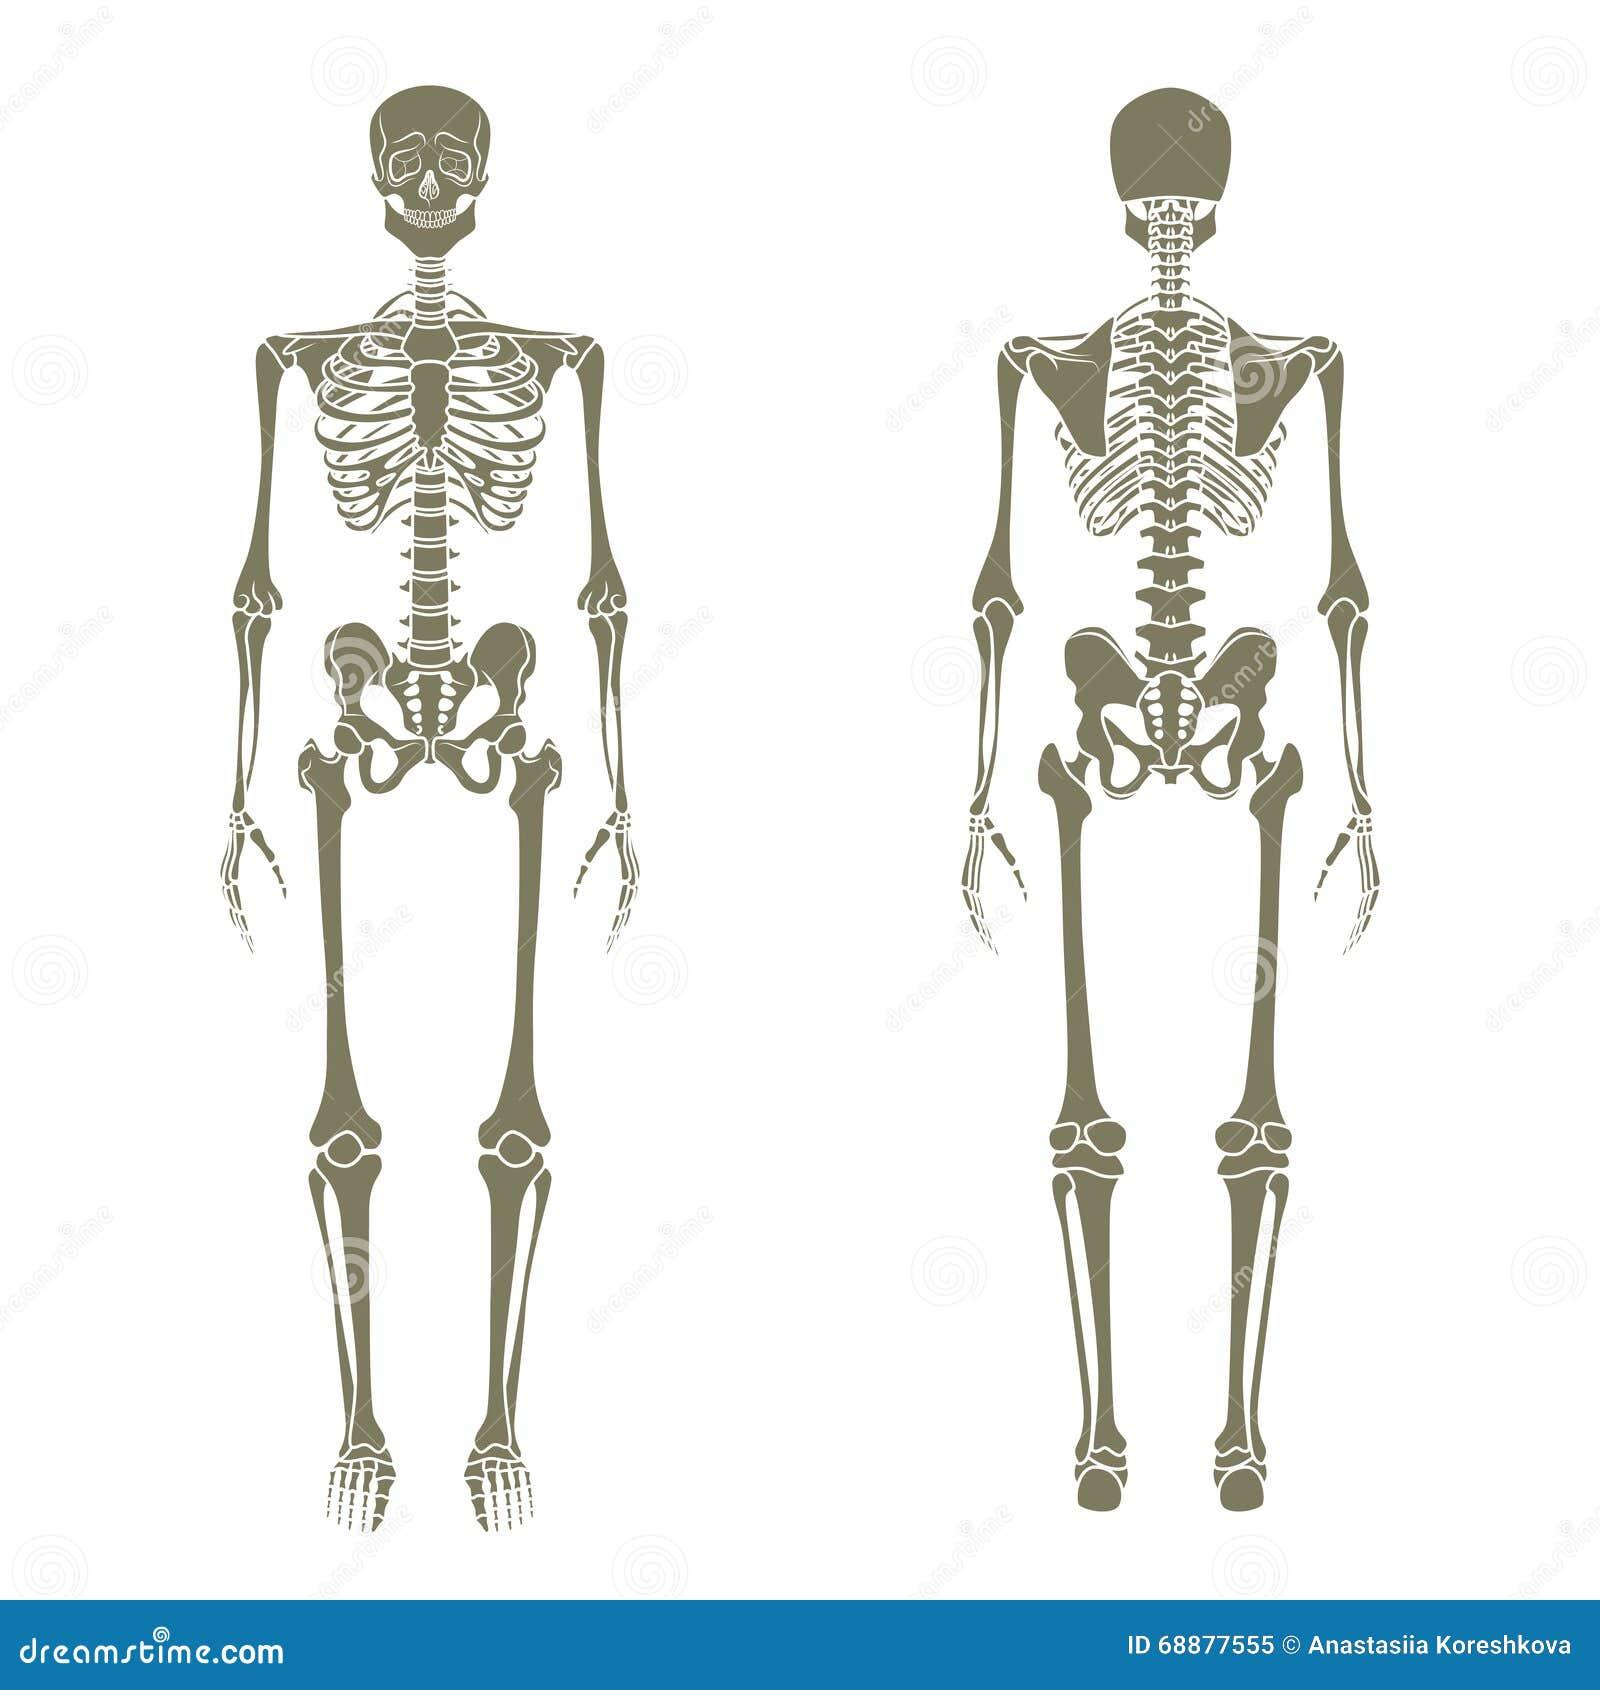 Vistoso Esqueleto Humano Etiquetado Composición - Anatomía de Las ...